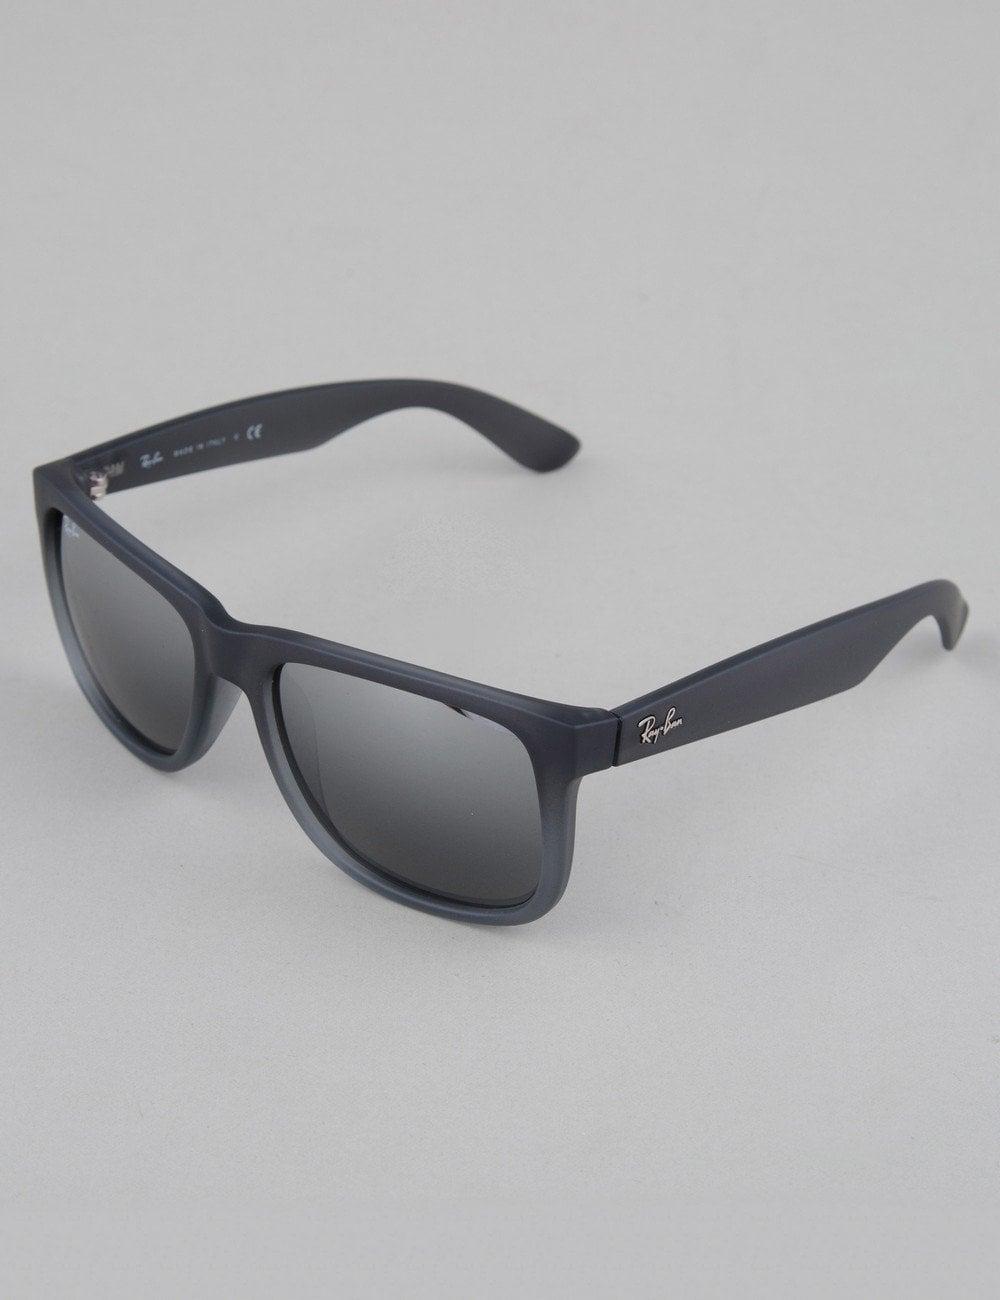 75a73a82b2 Ray-Ban Justin Sunglasses - Rubber Grey    Silver Mirror ...